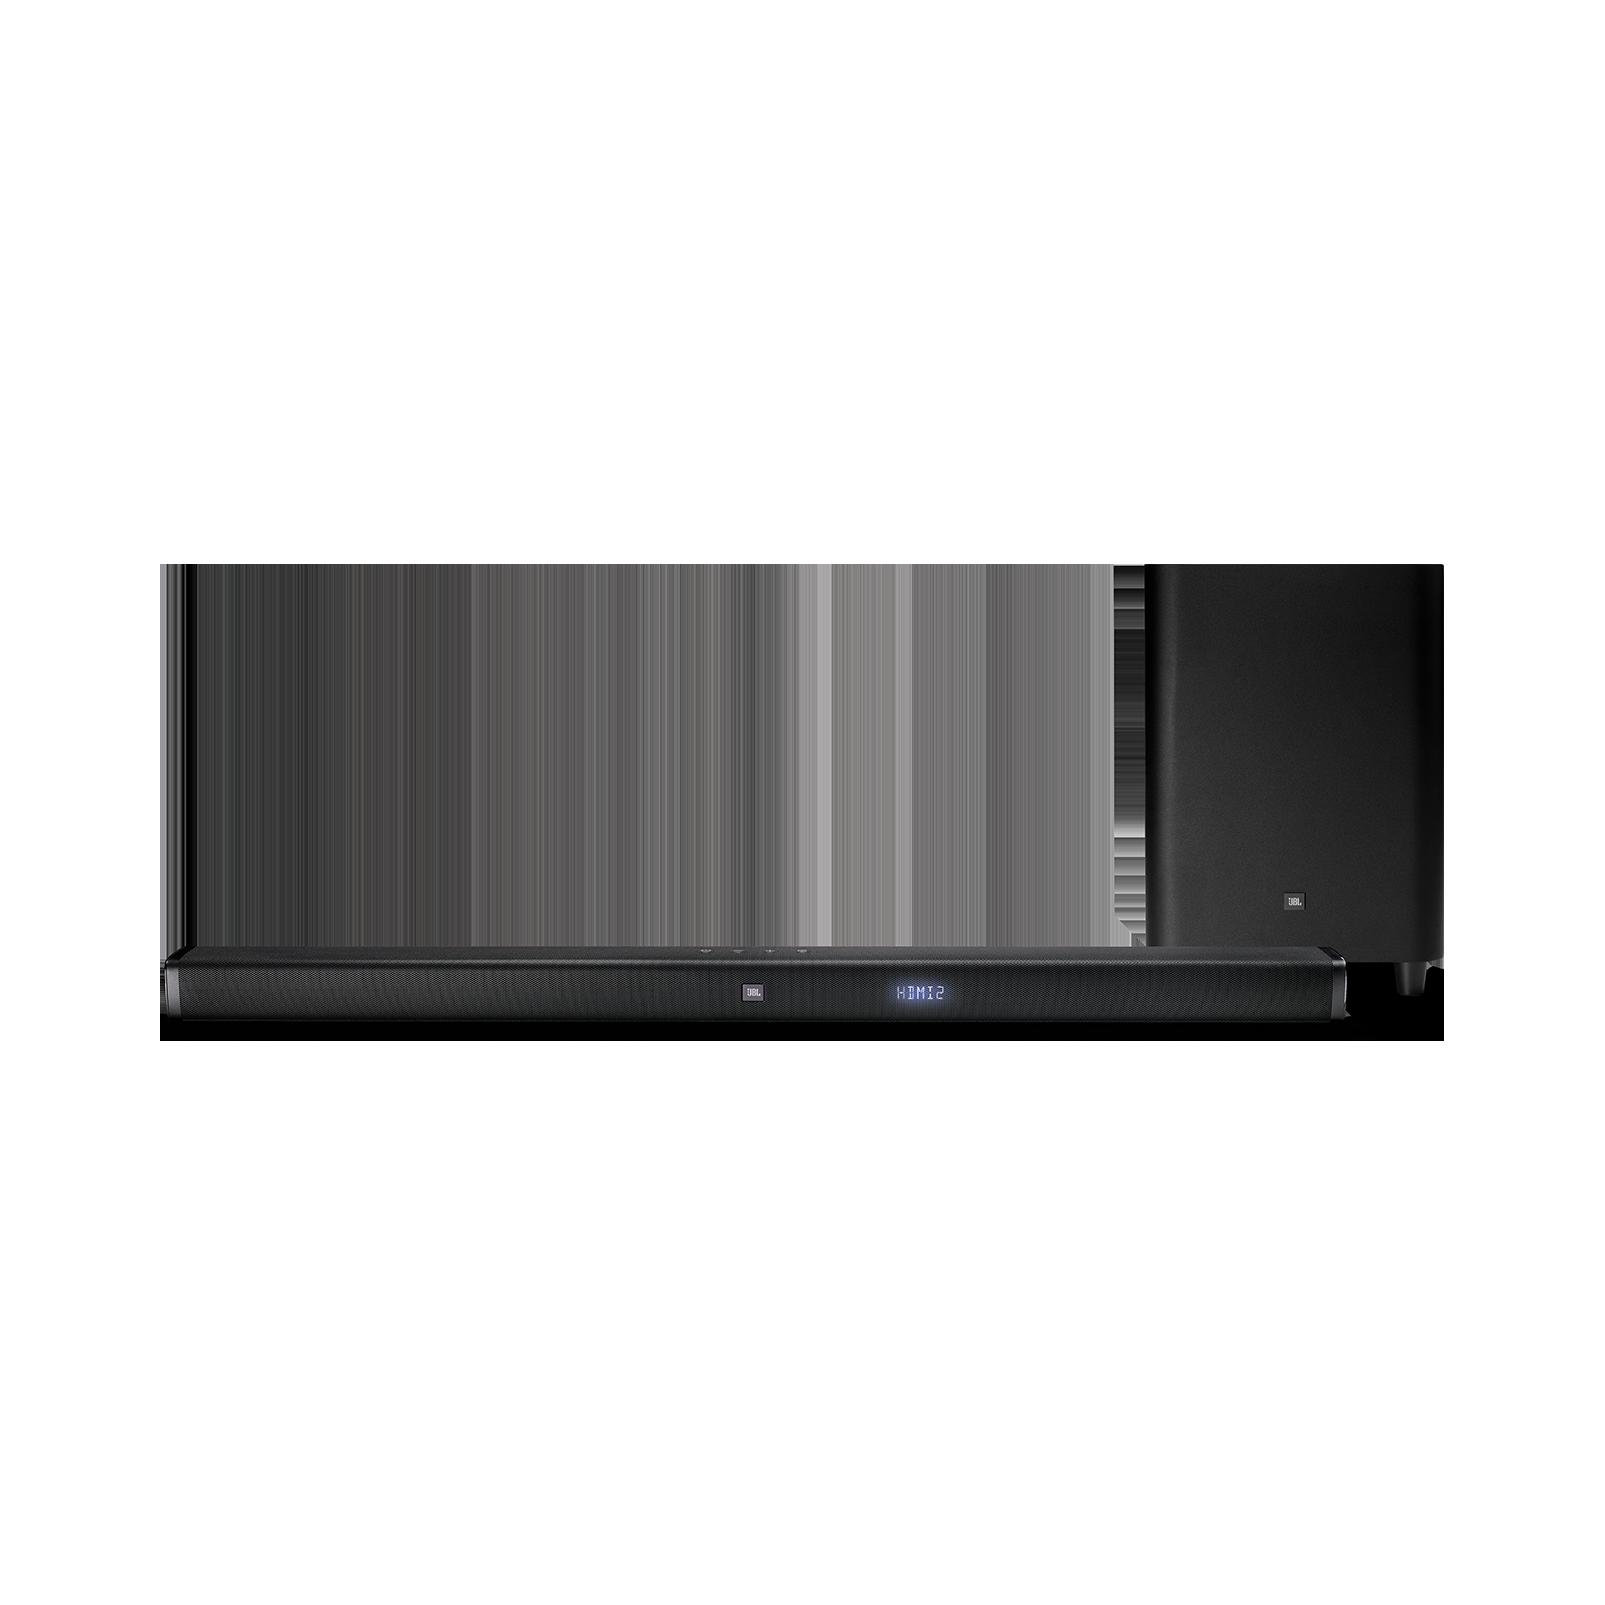 JBL Bar 3.1 - Black - 3.1-Channel 4K Ultra HD Soundbar with Wireless Subwoofer - Front